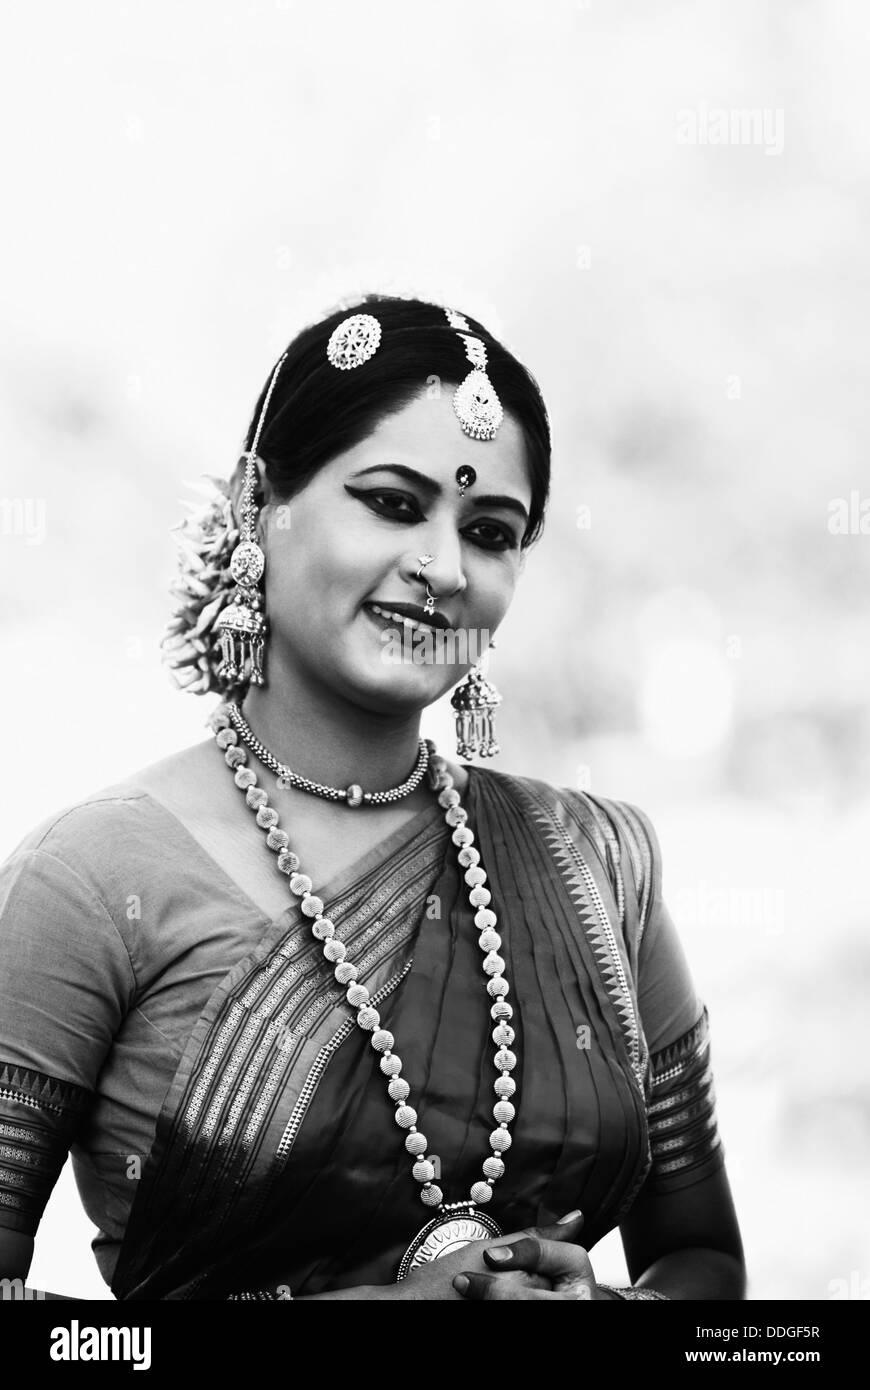 Bharatanatyam Dancer High Resolution Stock Photography And Images Alamy